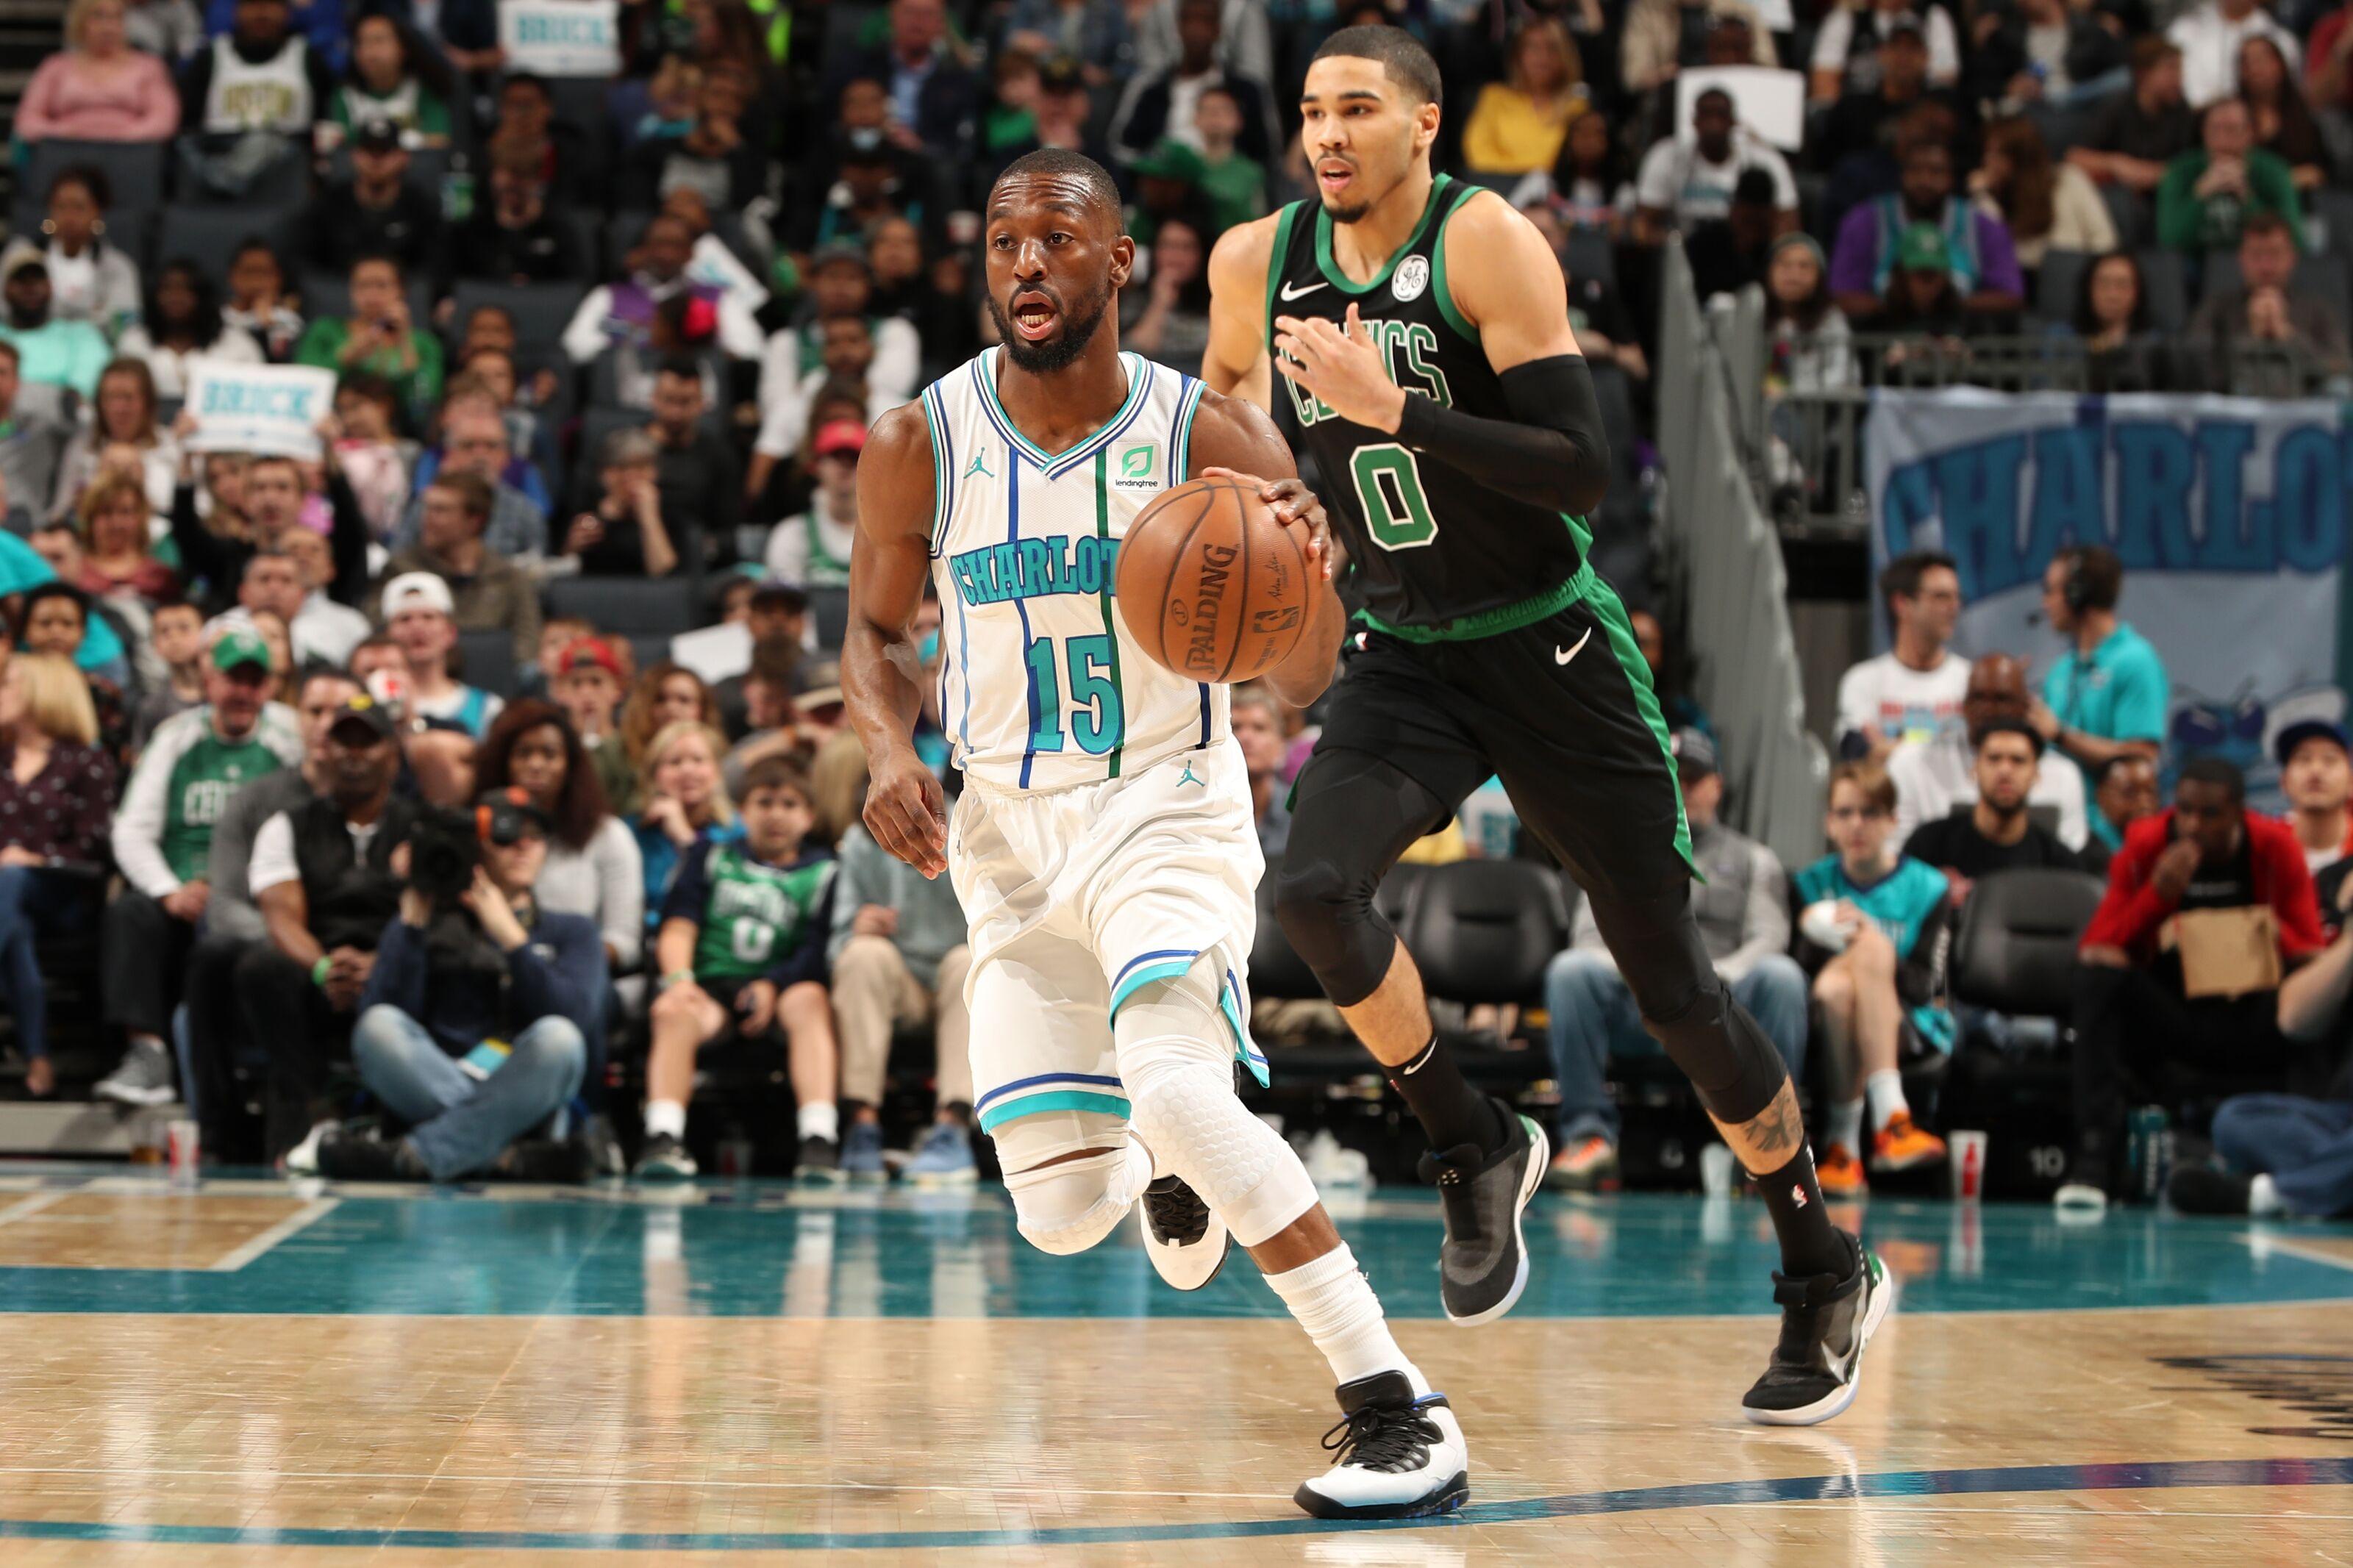 Projected Boston Celtics depth chart if Kemba Walker signs